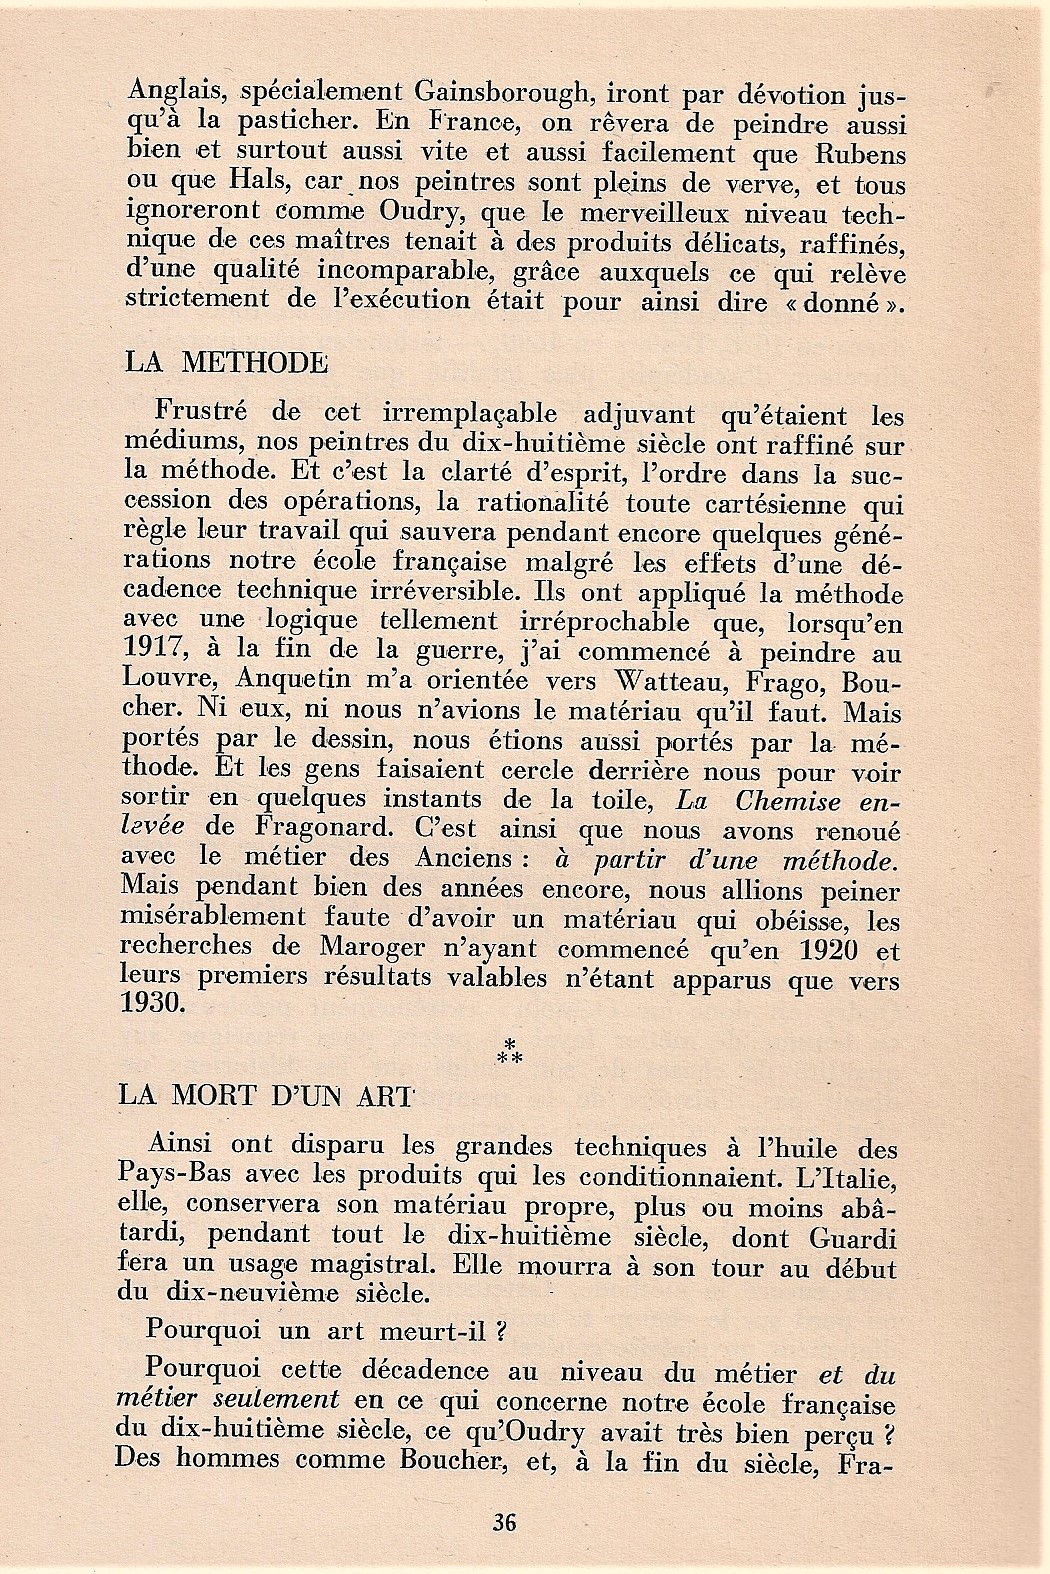 versini-page-36.jpg